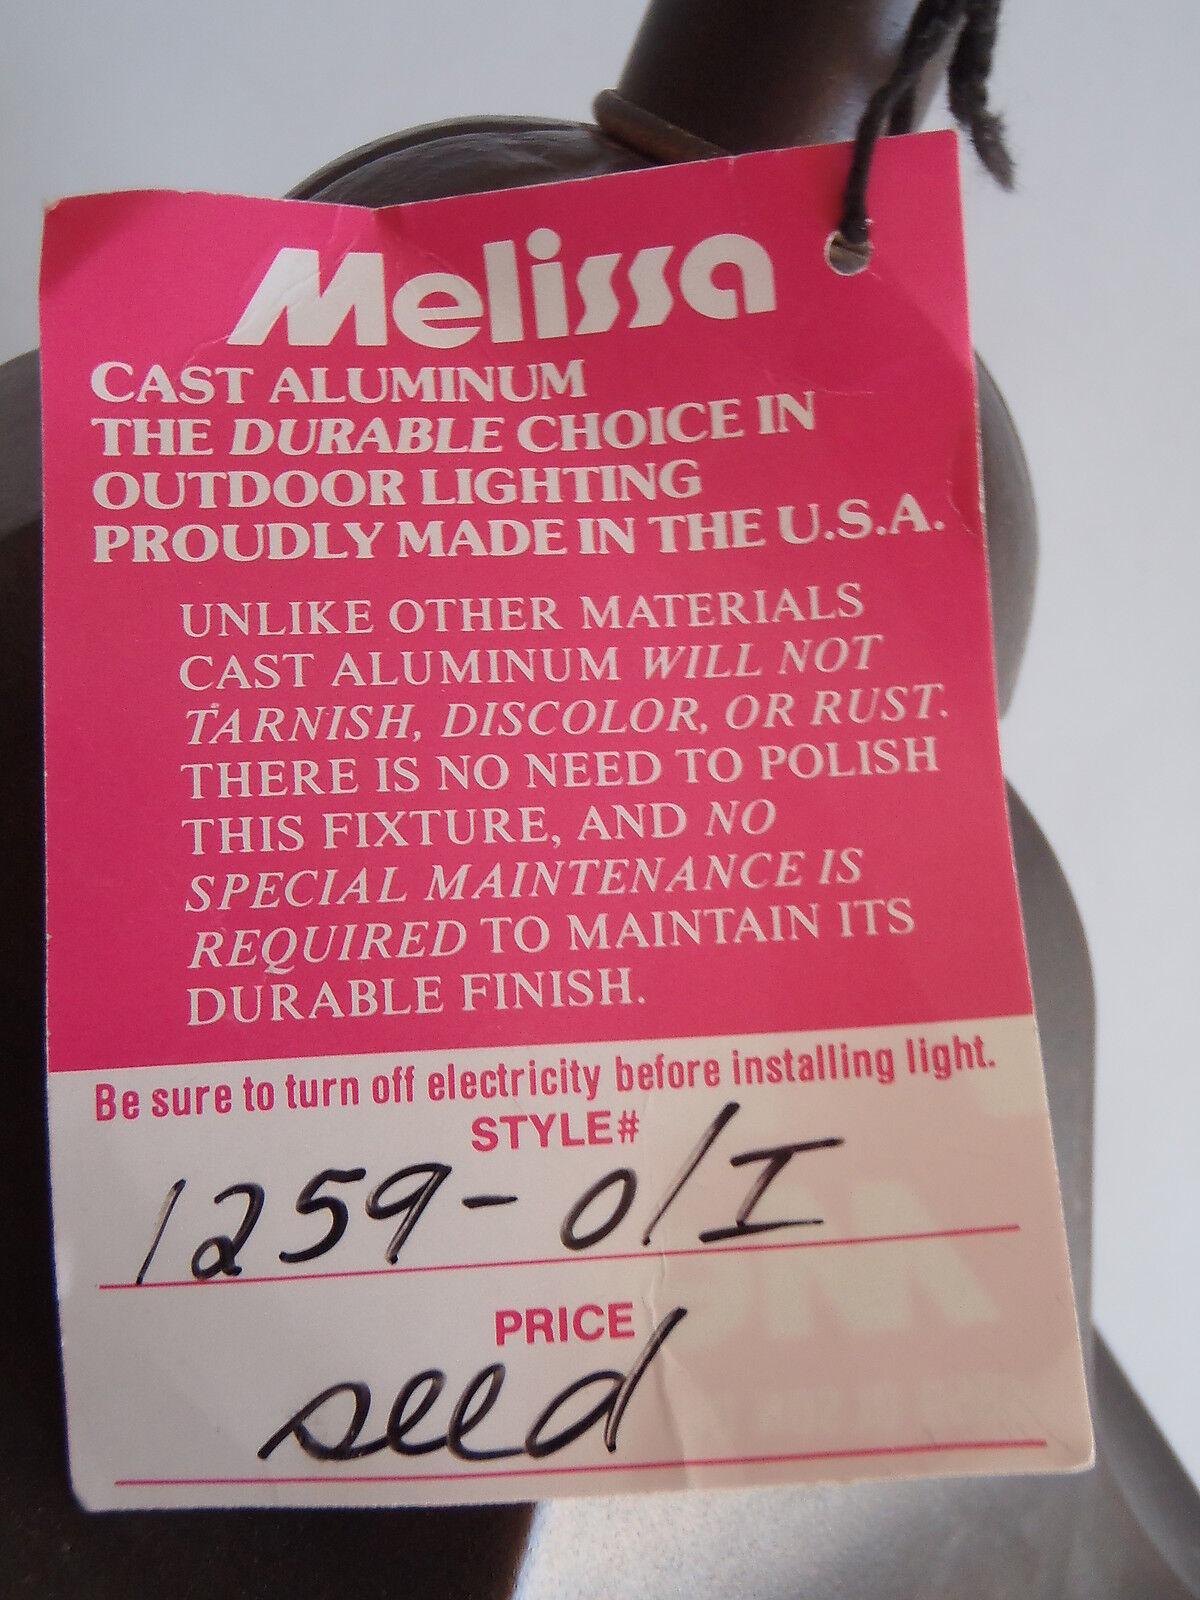 Outdoor Wall Porch Light Melissa 1259-O I 22x12x9 22x12x9 22x12x9  120v 4ab9c9